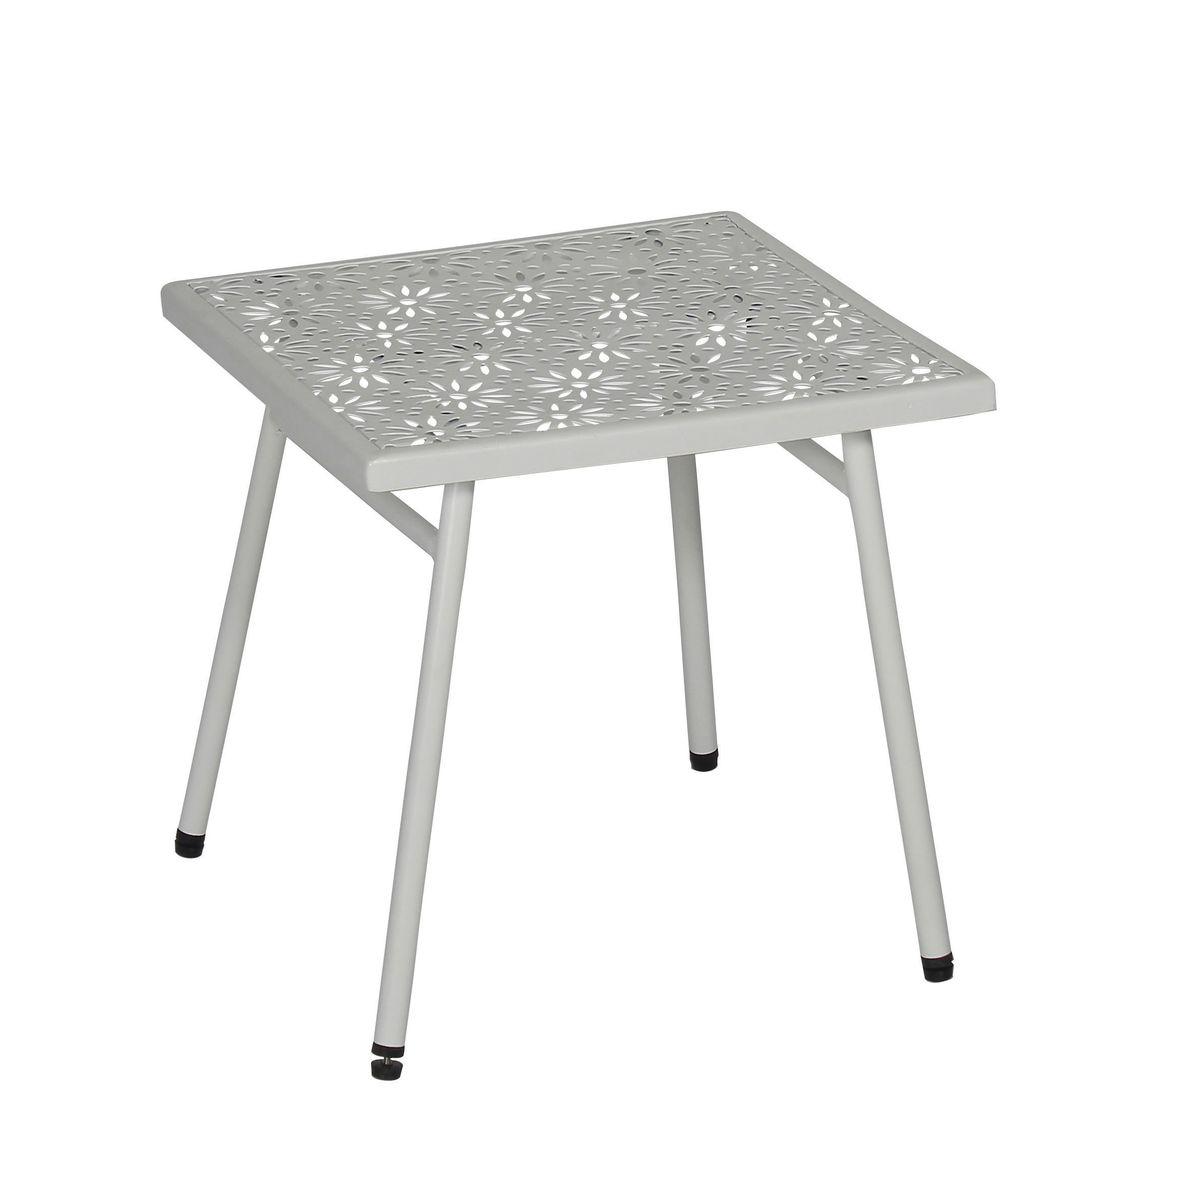 Table basse en métal blanc L40